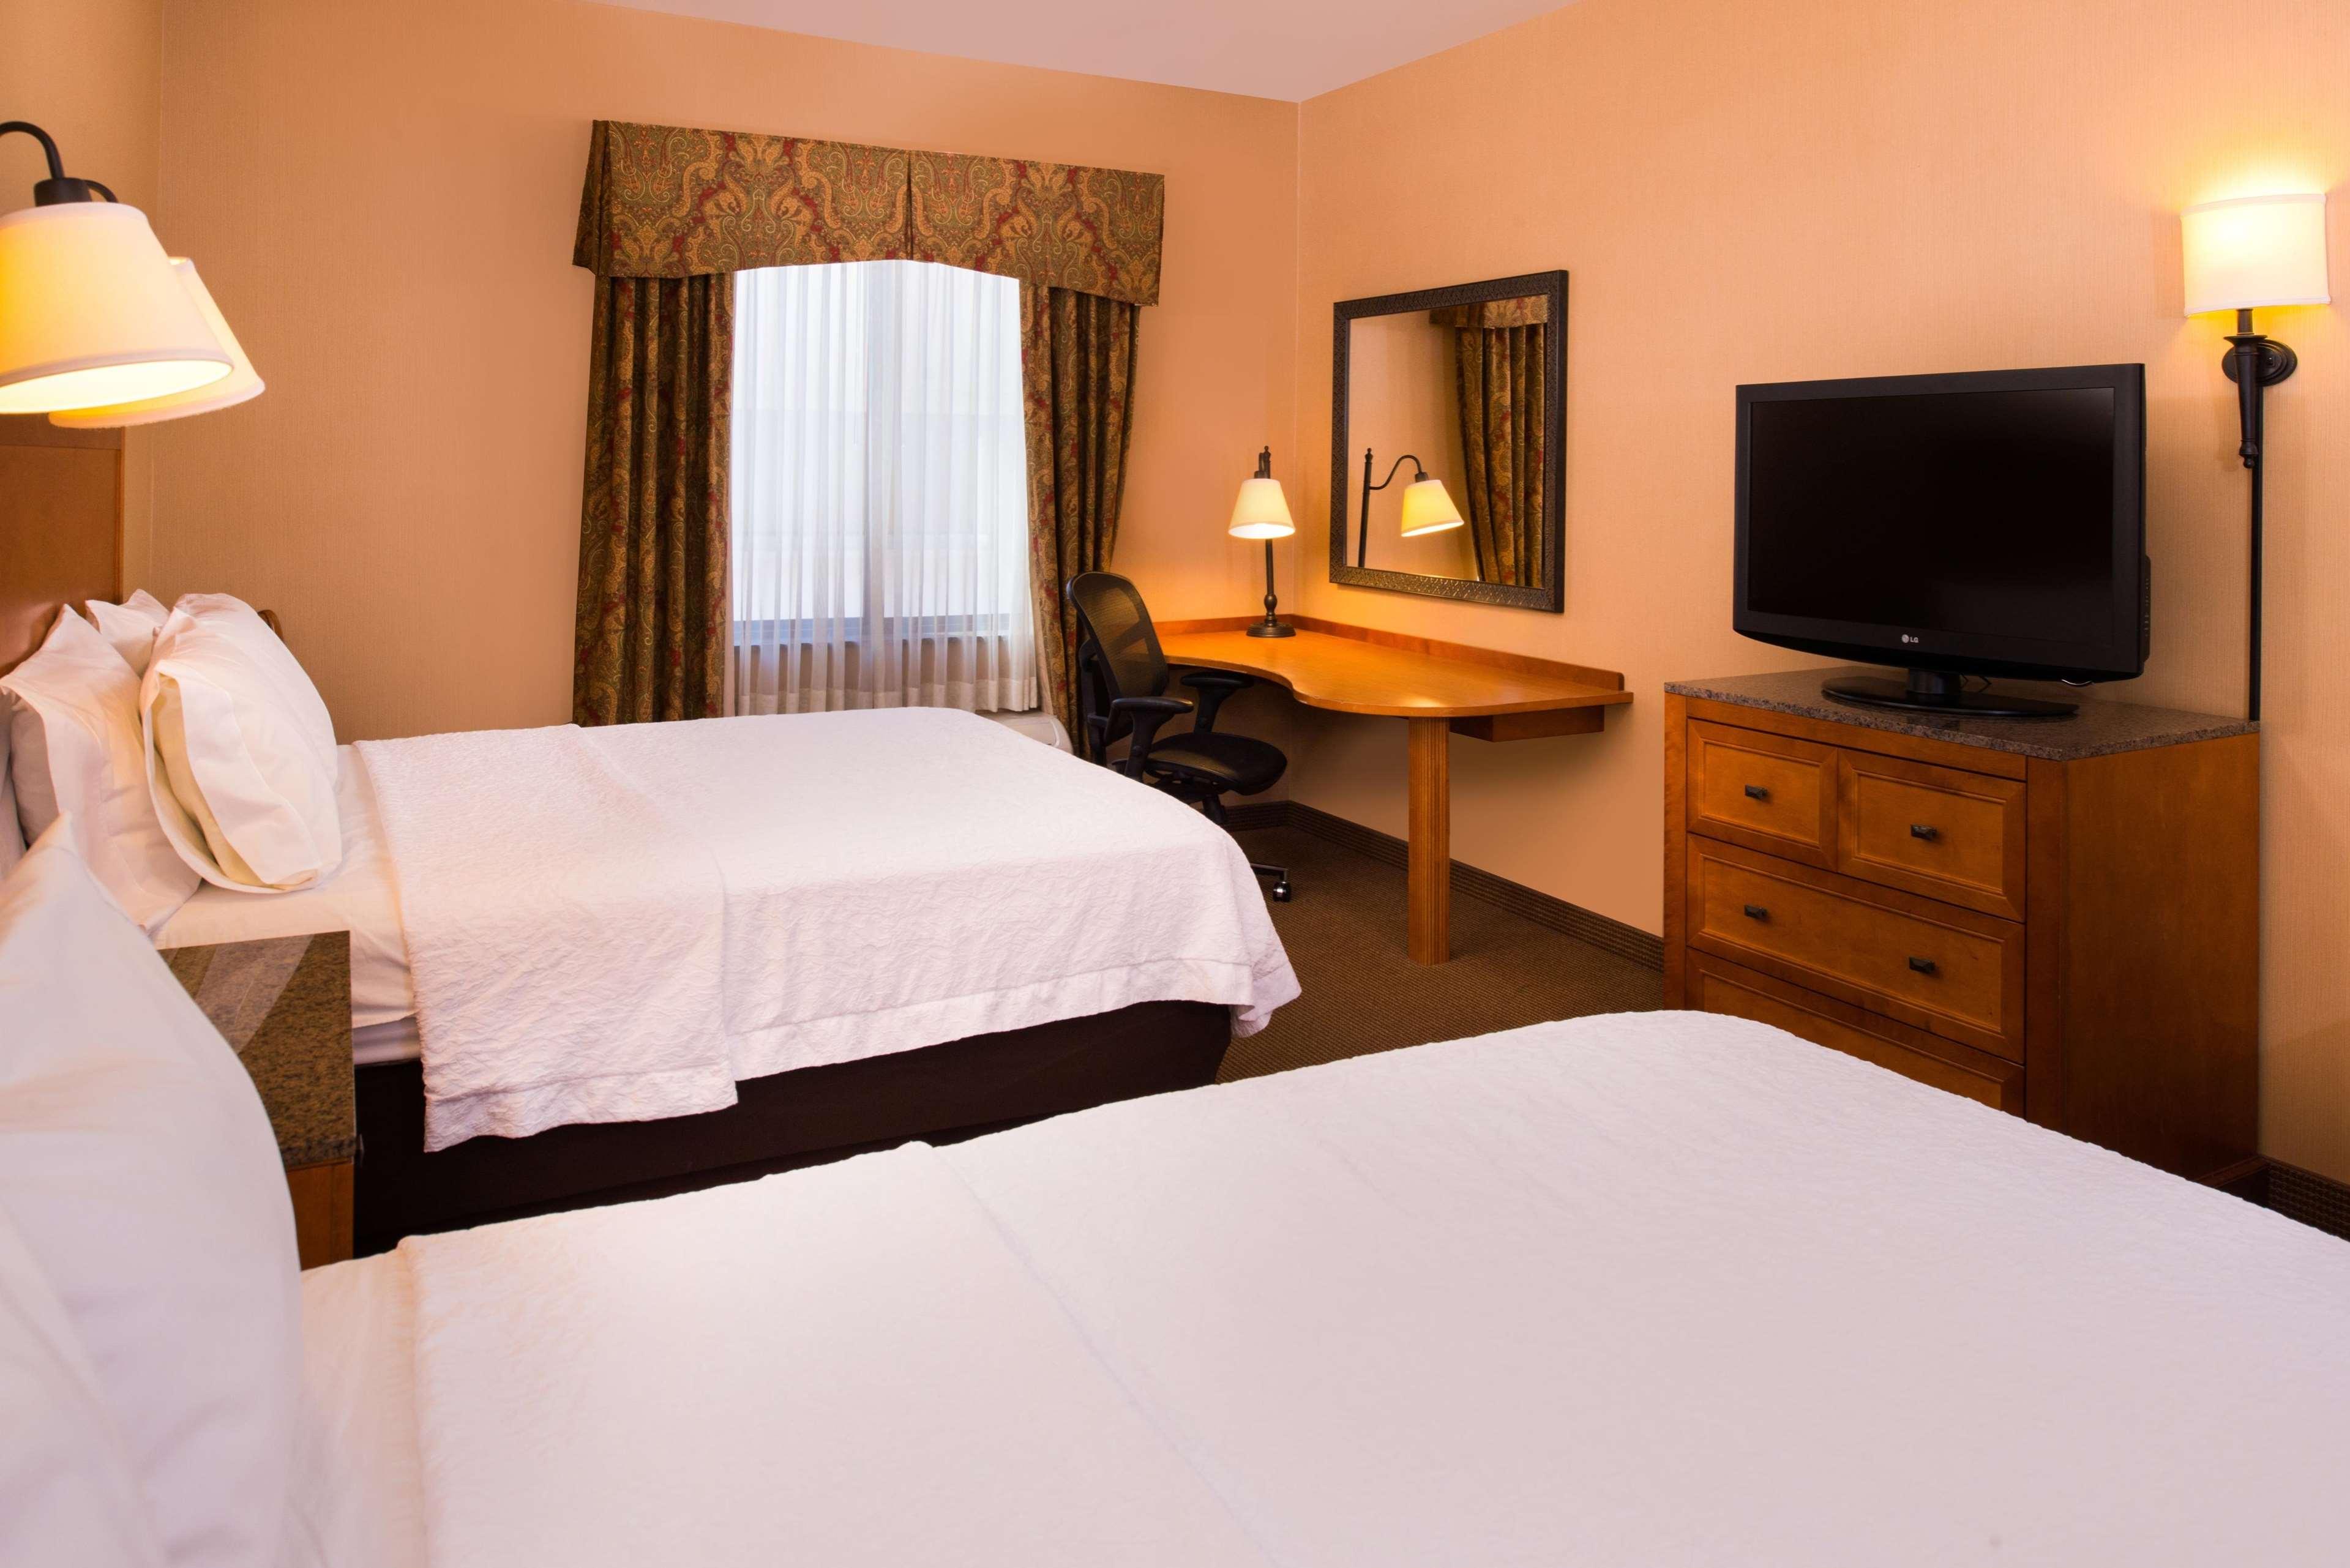 Hampton Inn & Suites Salt Lake City-West Jordan image 29